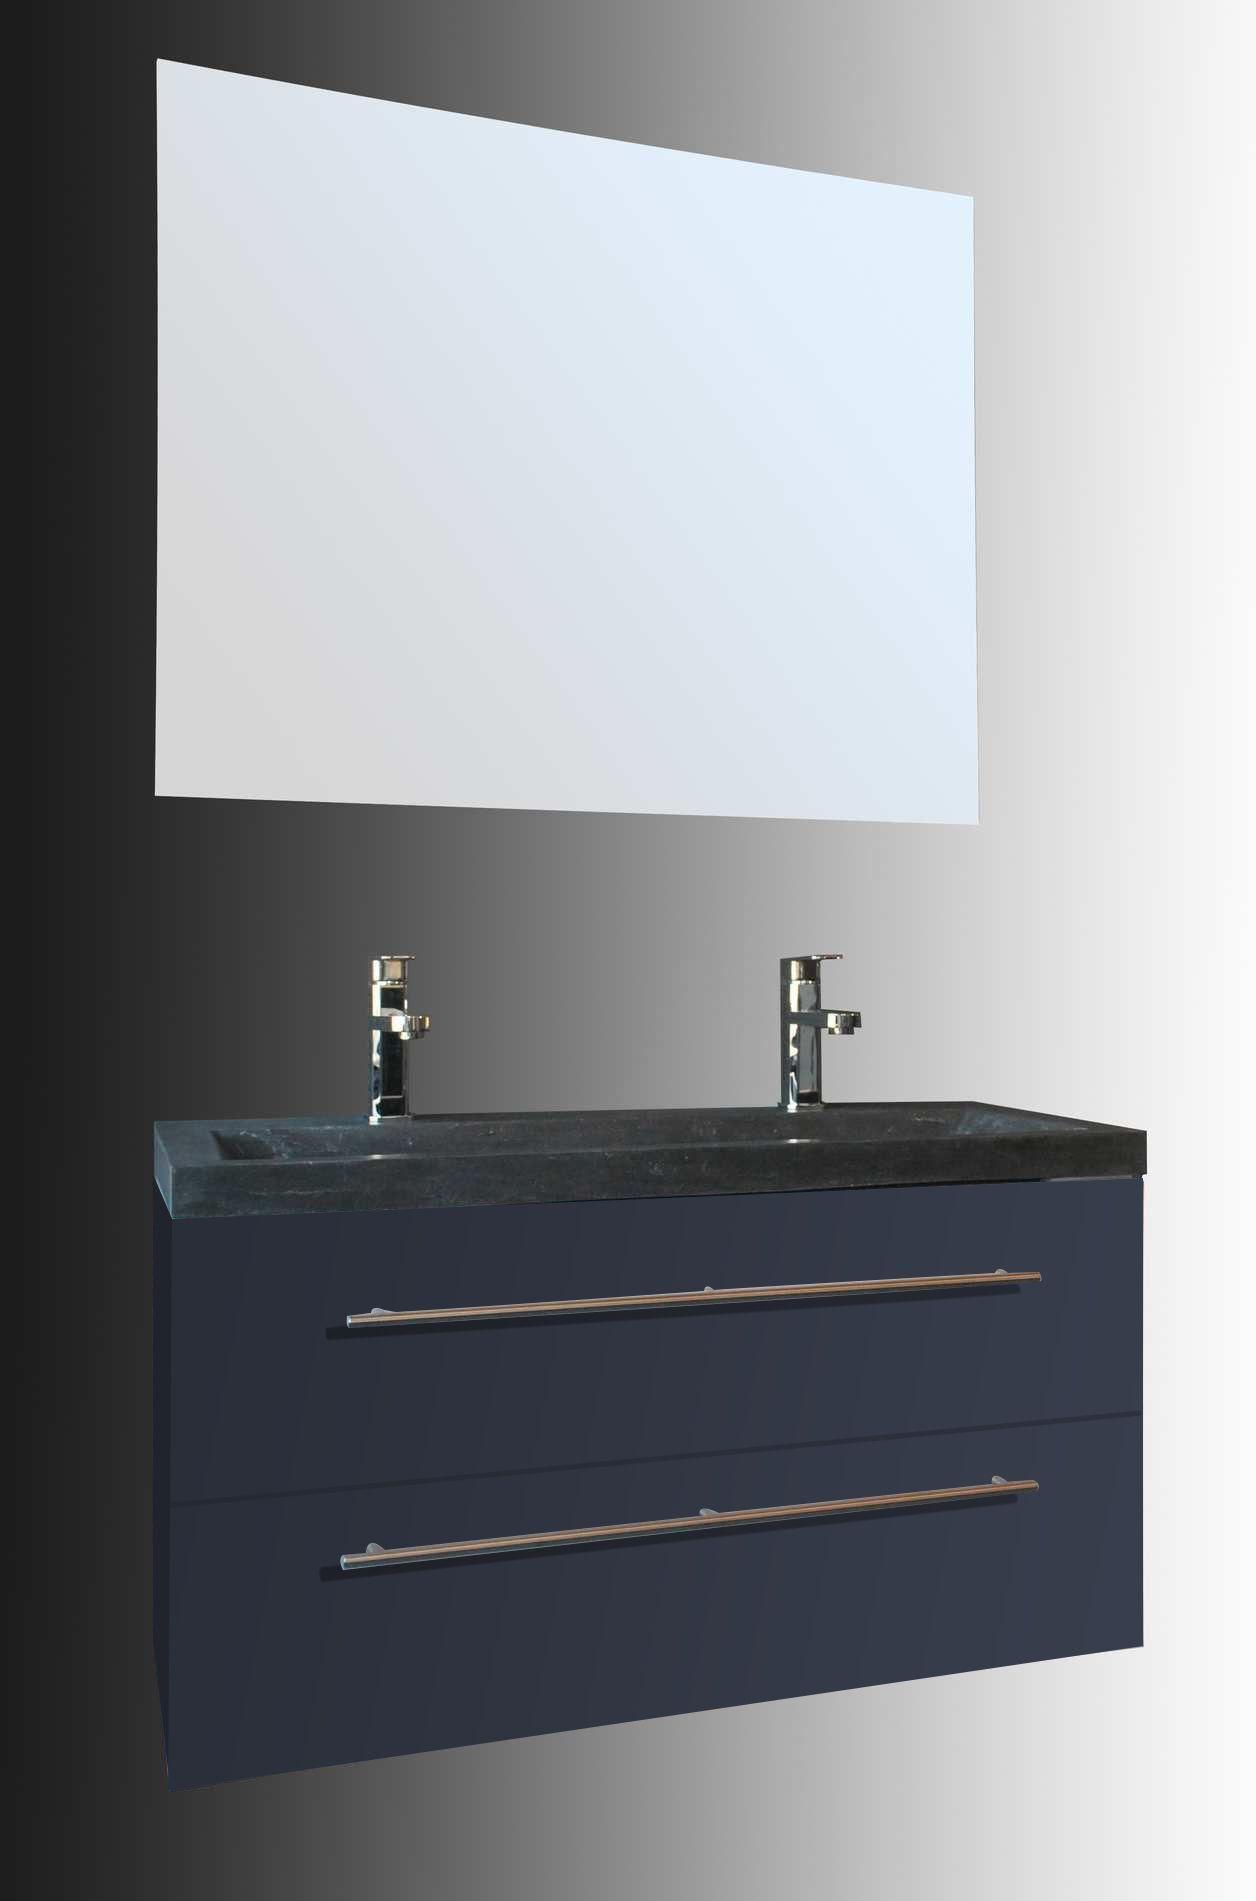 Lambini Designs Compact Stone badkamermeubel hoogglans antraciet 100cm, 2 kraangaten